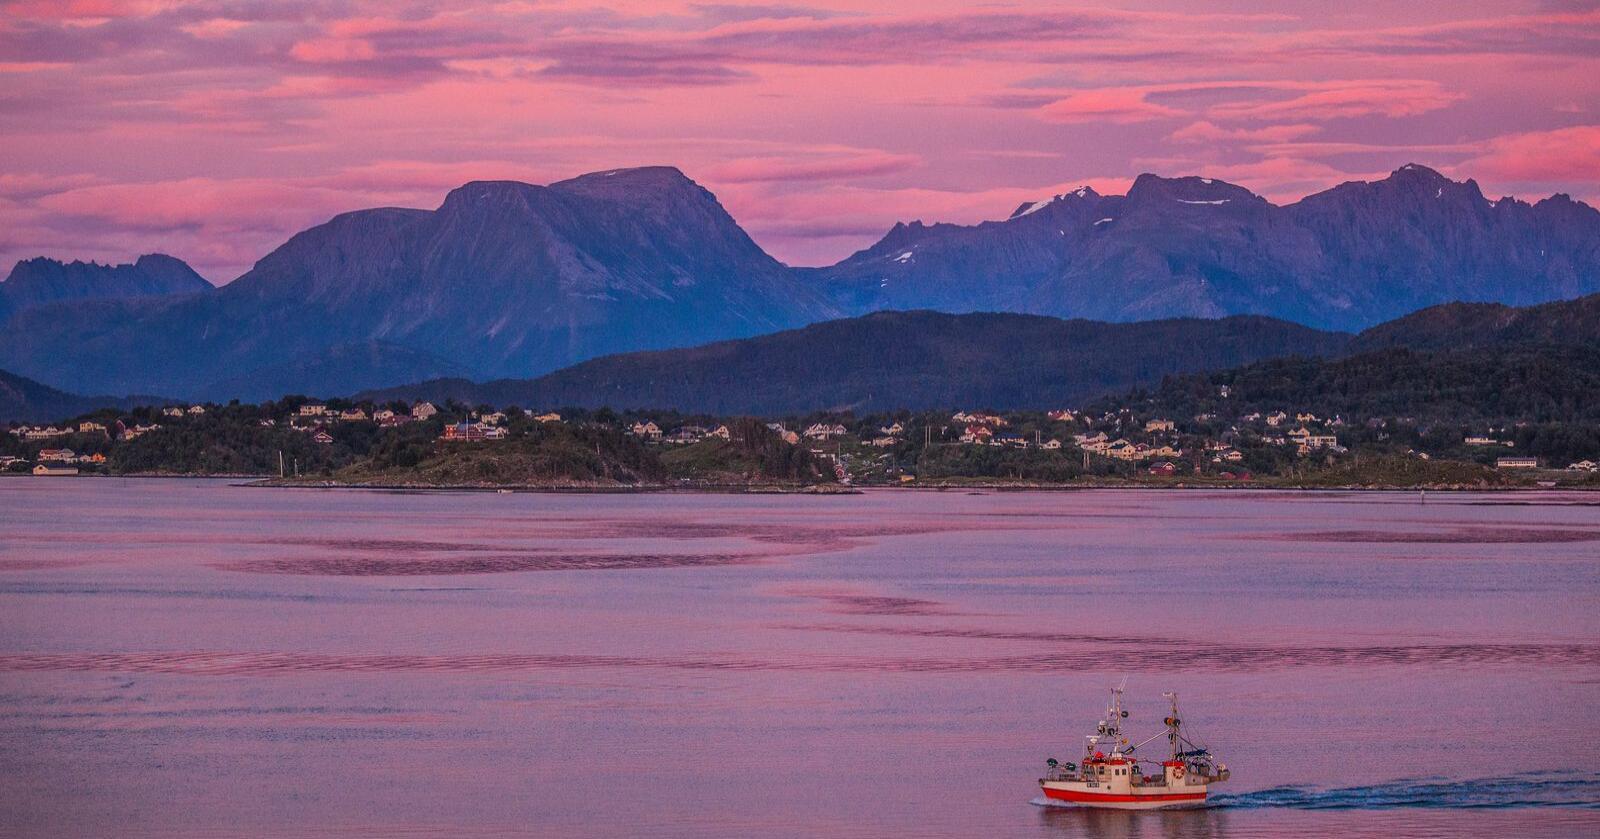 Liten fiskebåt på vei inn Hessafjorden til Ålesund.Foto: Halvard Alvik / NTB